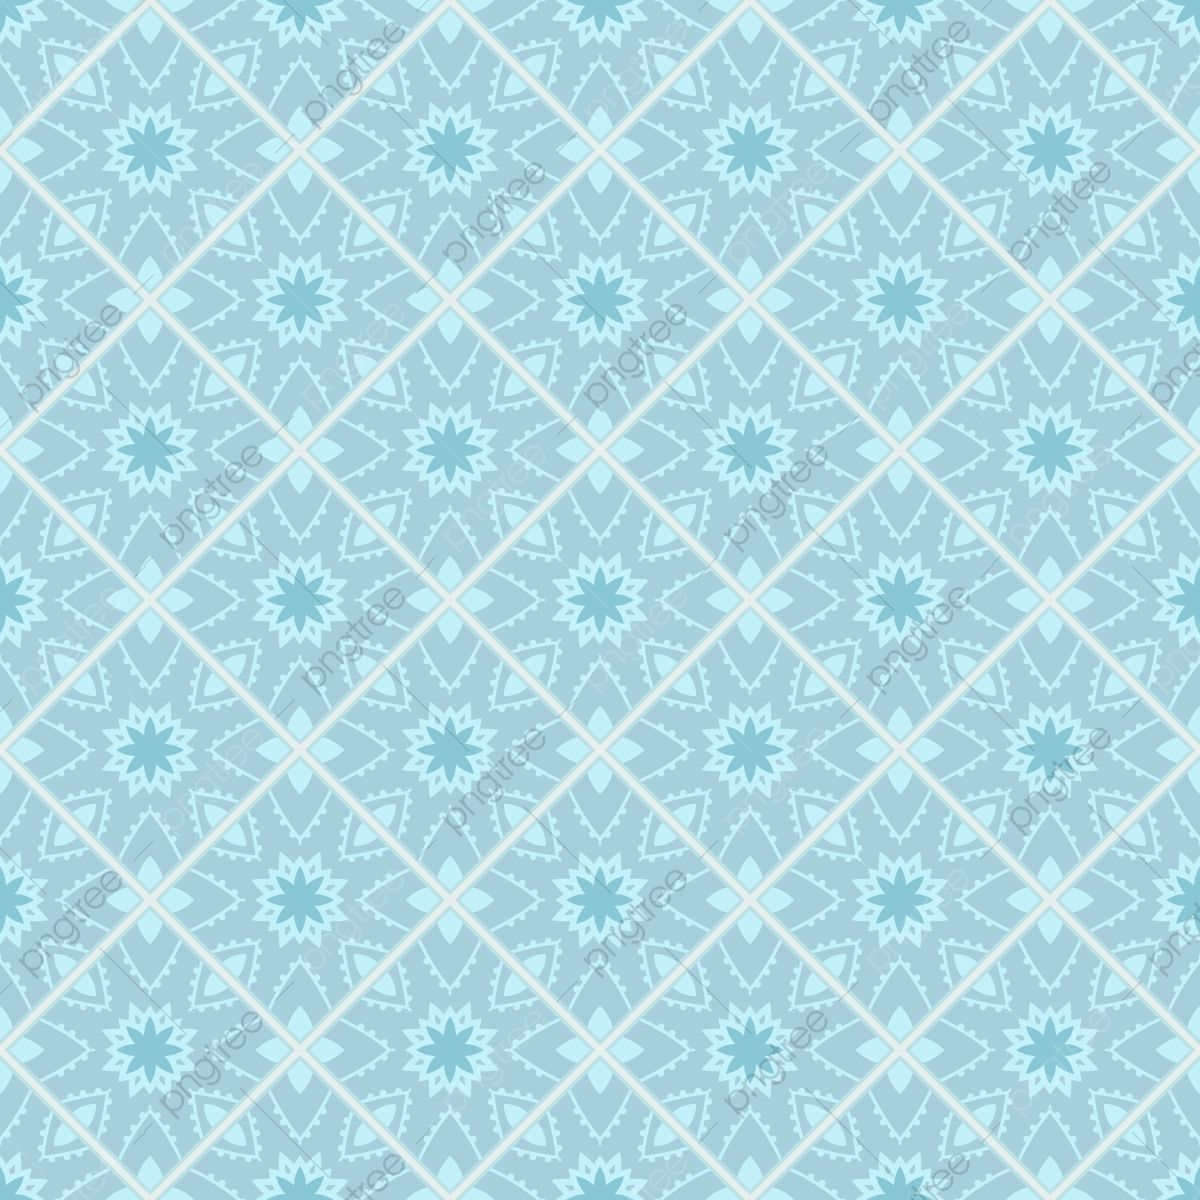 Vintage Floor Tiles Pattern Tile Pattern Tiles Png And Vector With Transparent Background For Free Downloa Patterned Floor Tiles Tile Patterns Vintage Floor